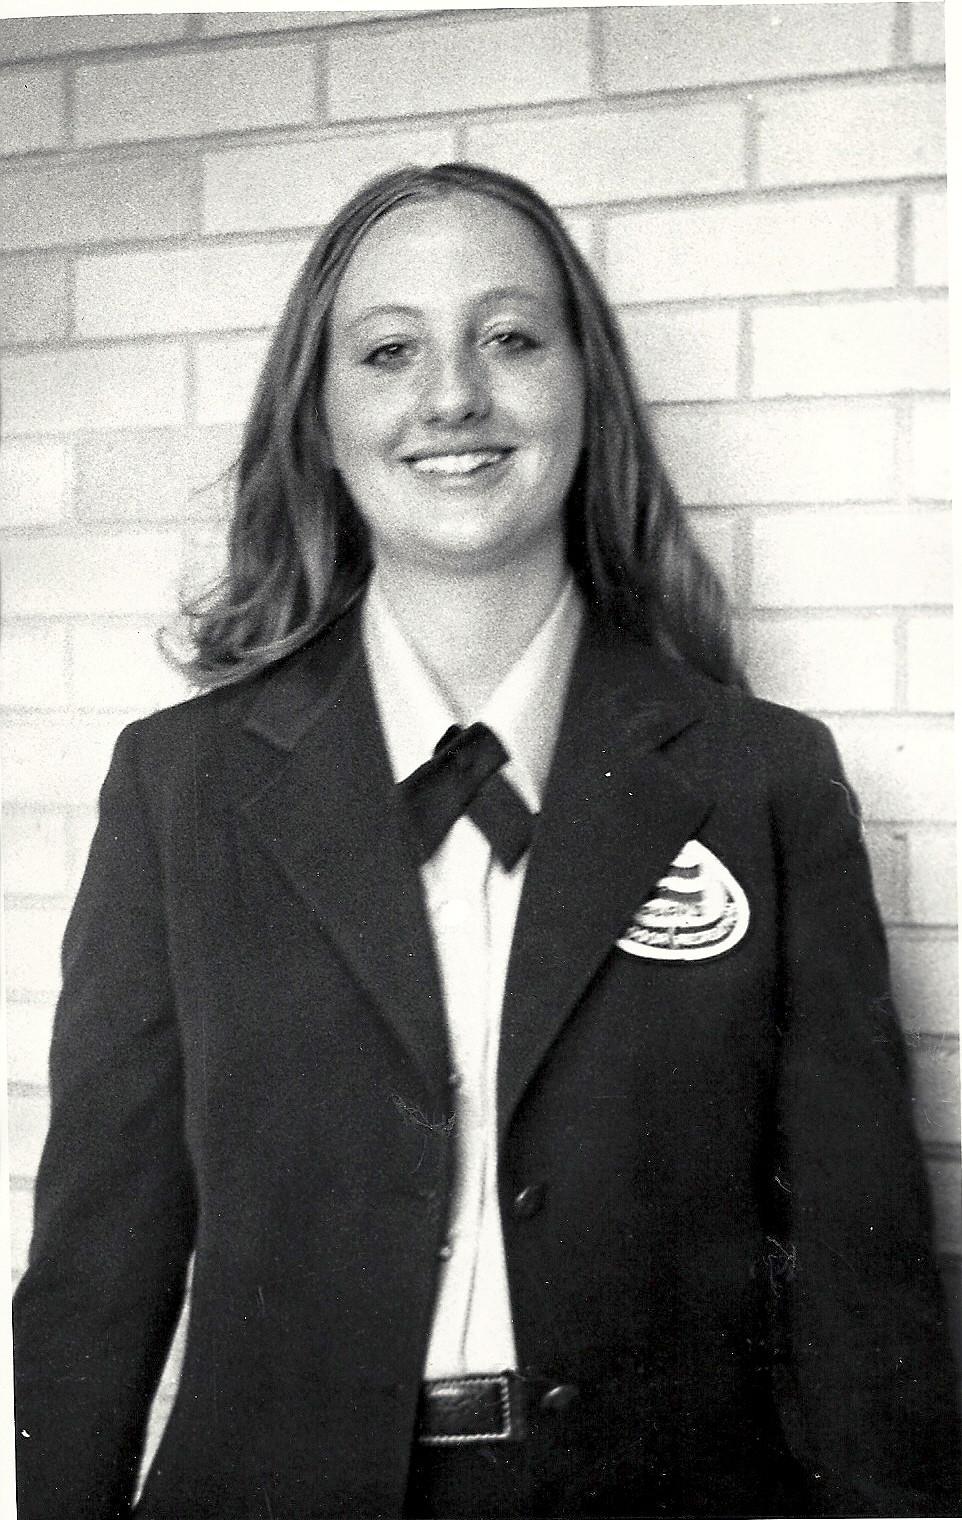 Carolyn Armstrong (1974)